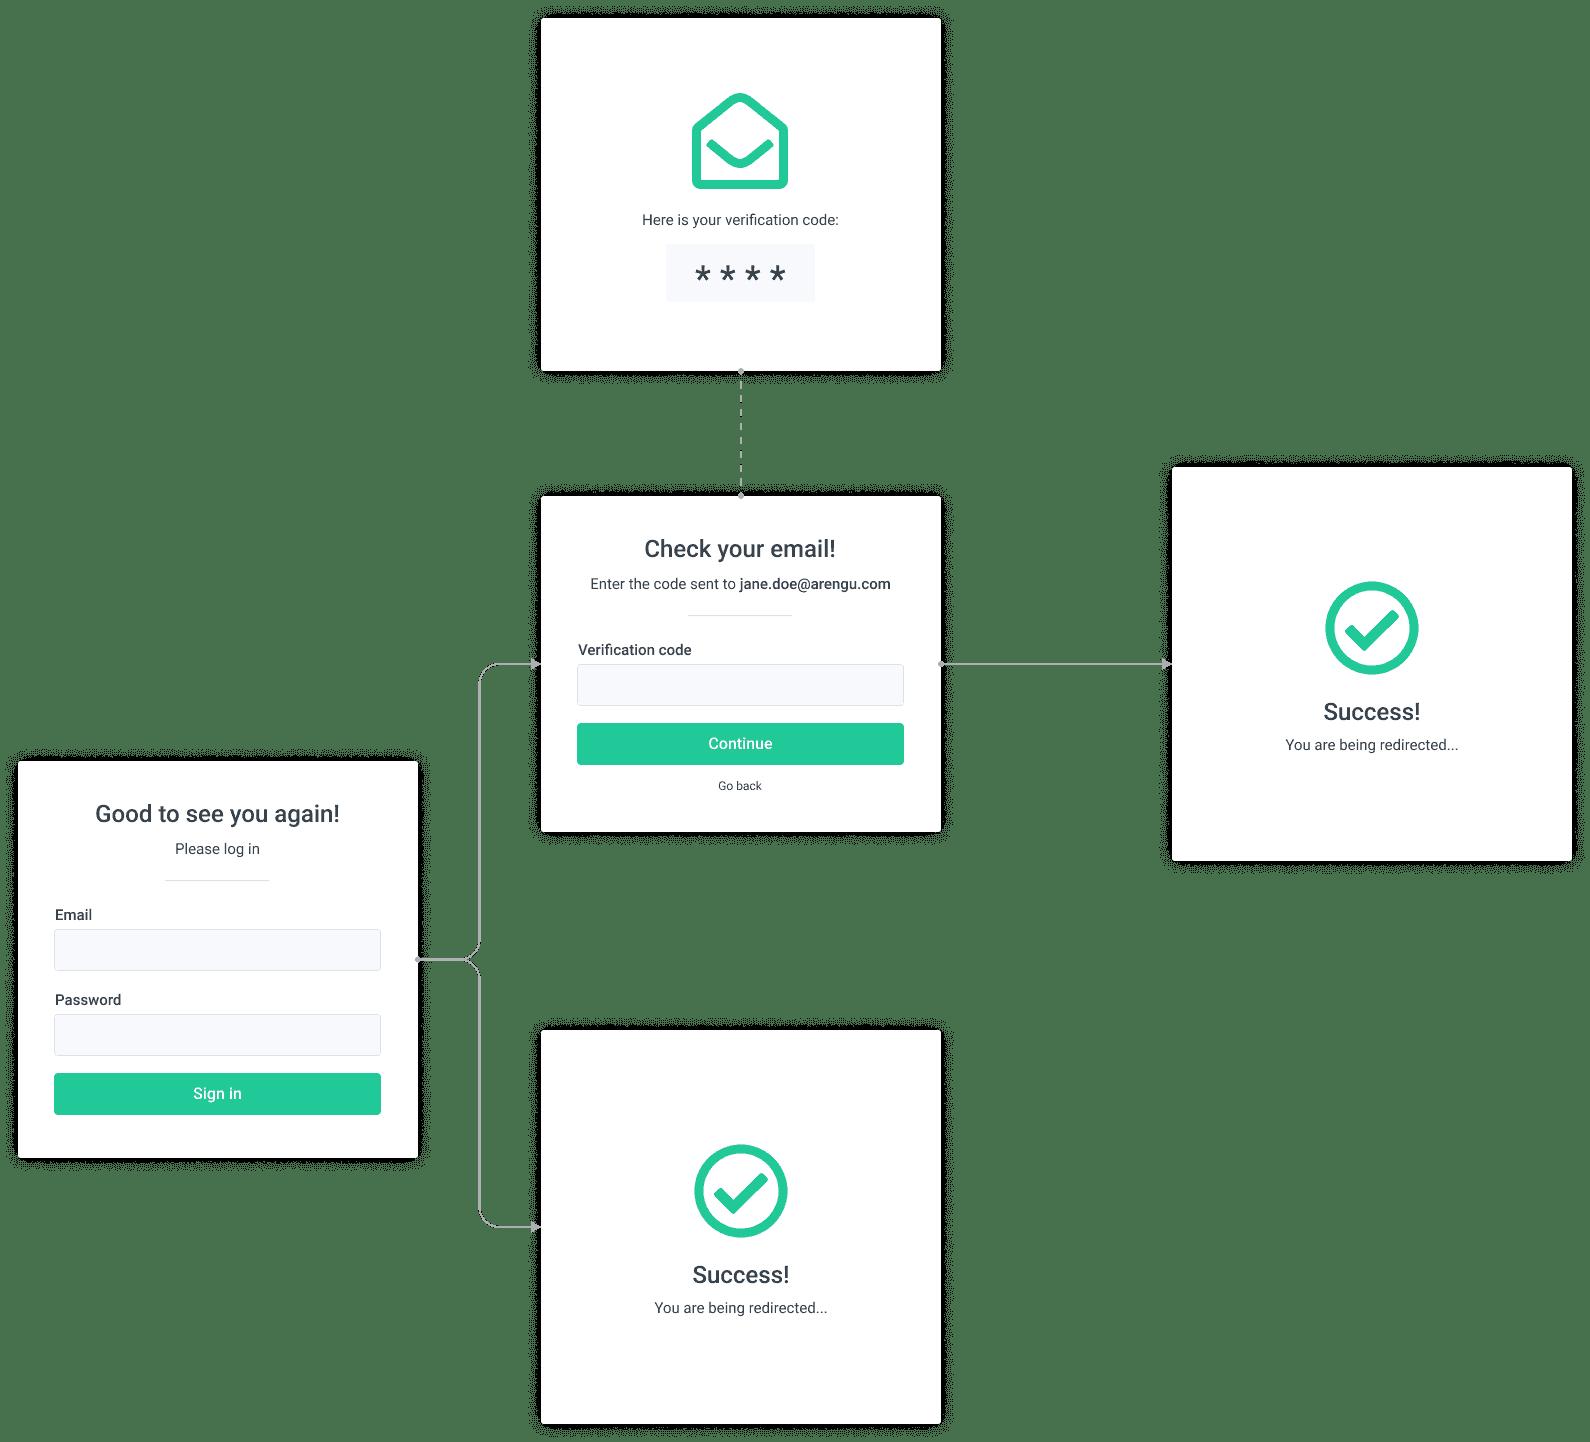 Adaptive multifactor authentication